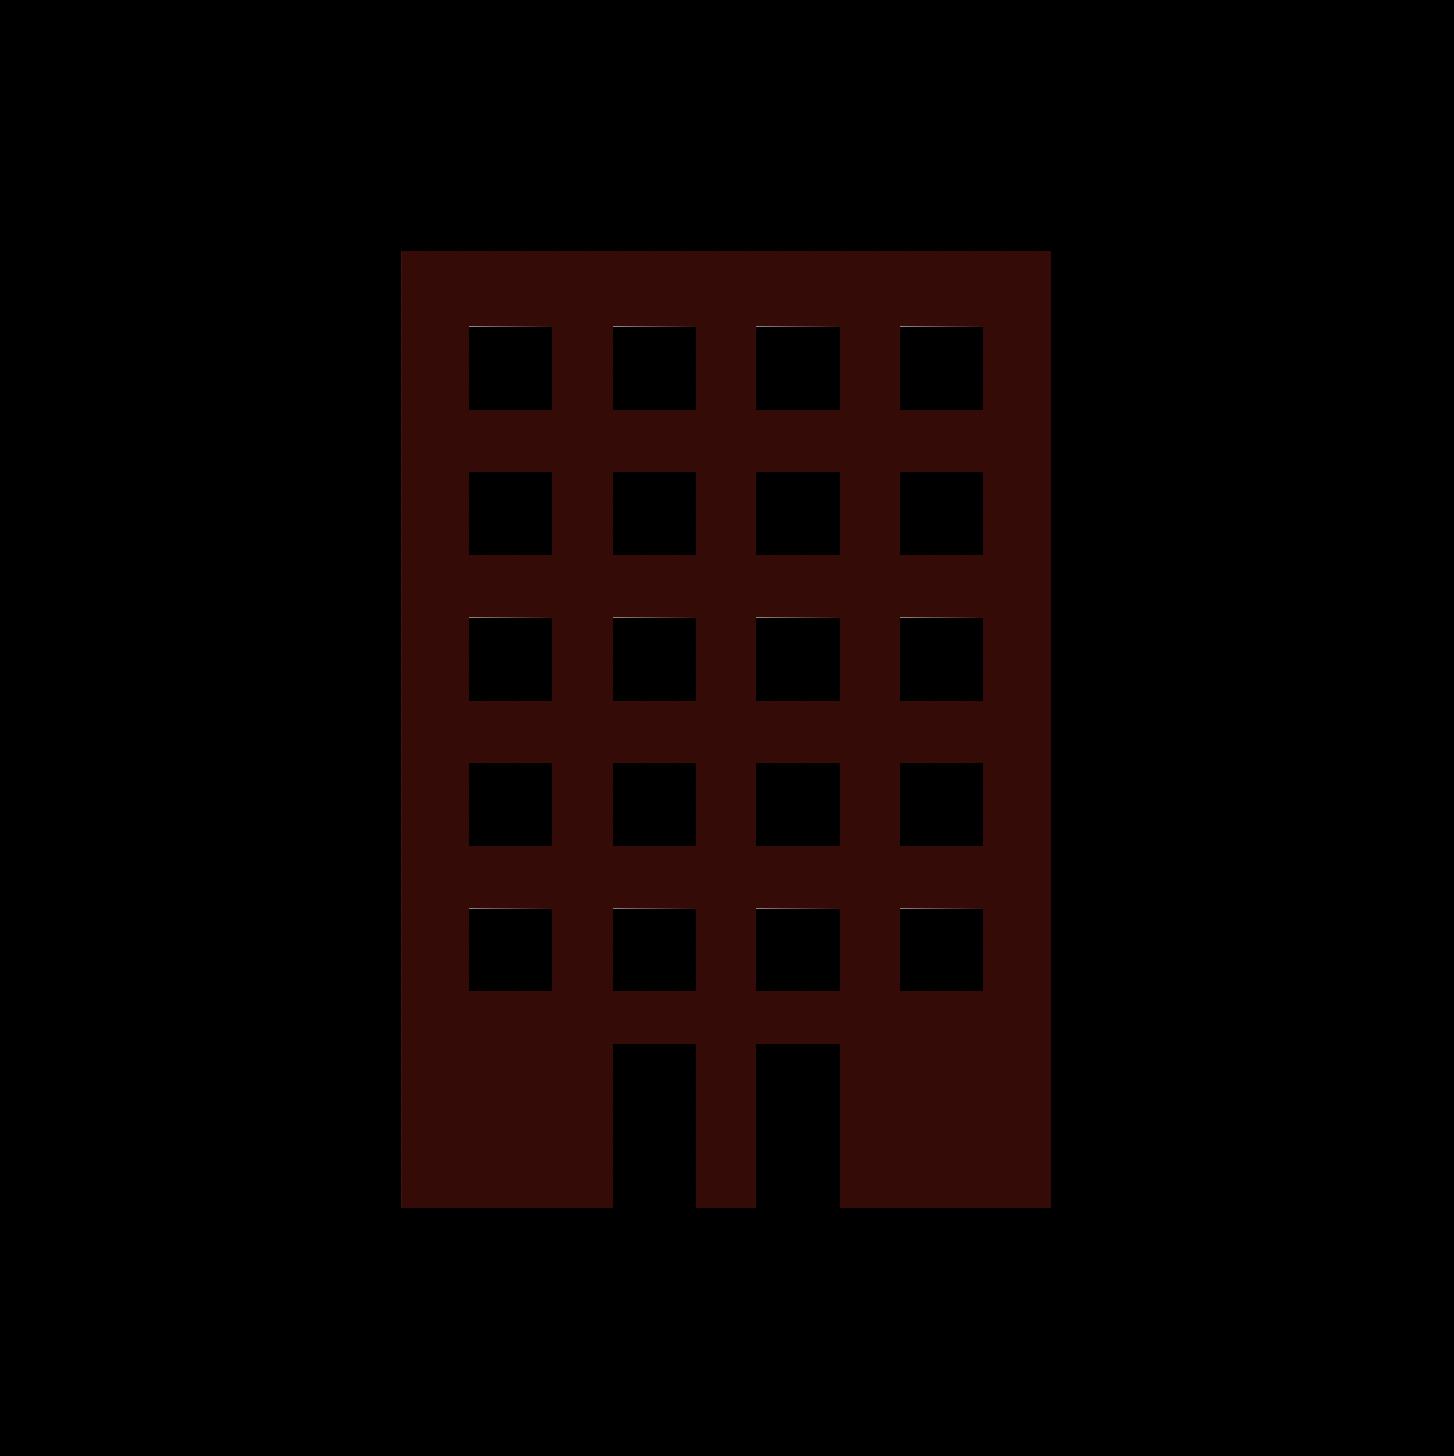 Geschosswohnungsbau -